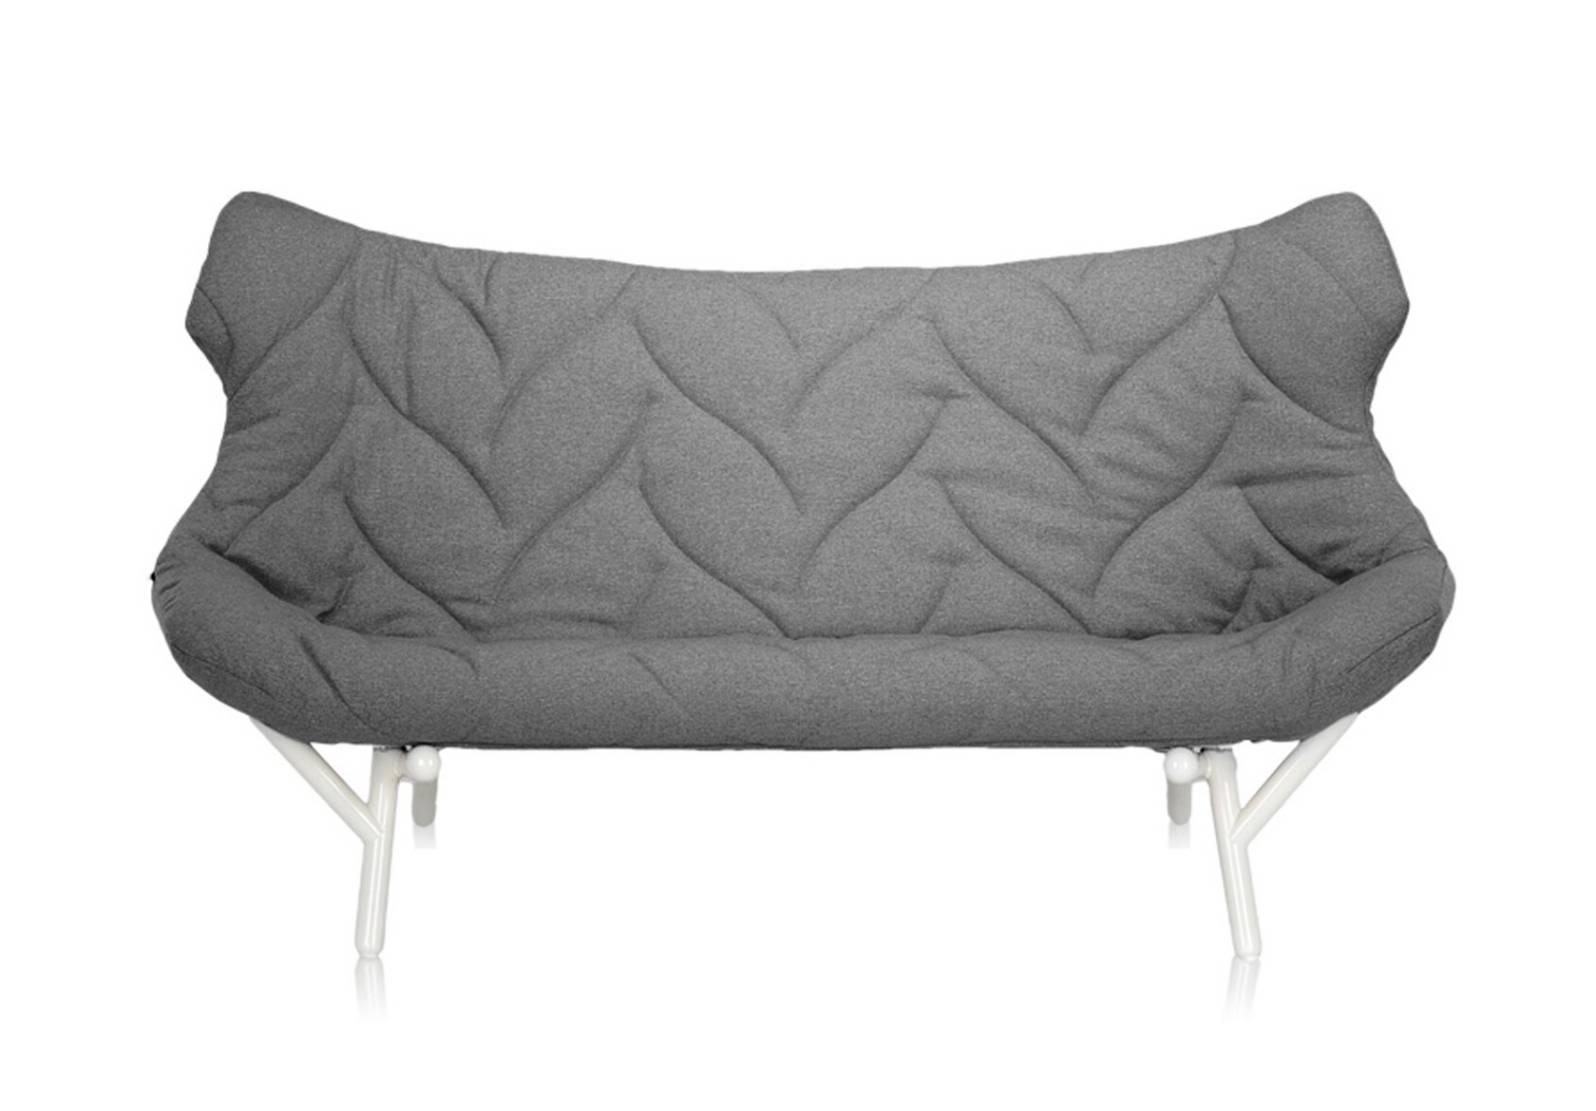 Foliage Sofa, grau